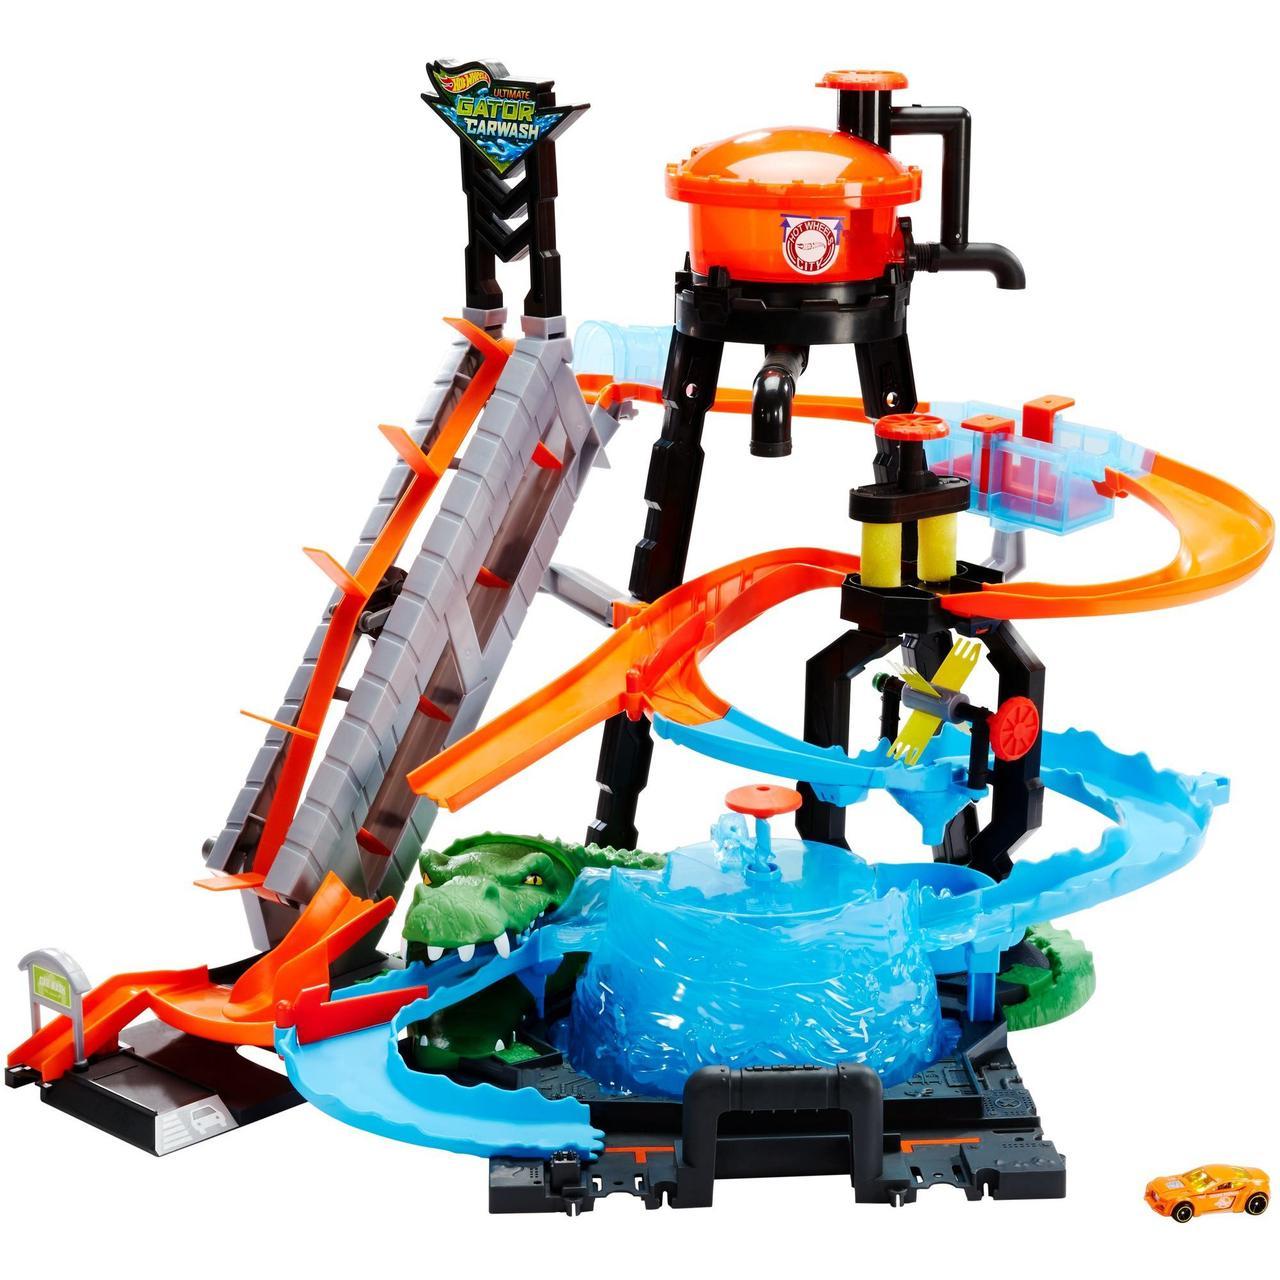 Hot Wheels Трек измени цвет водонапорная башня взрыв цветов Ultimate Gator Car Wash Play Set with Color